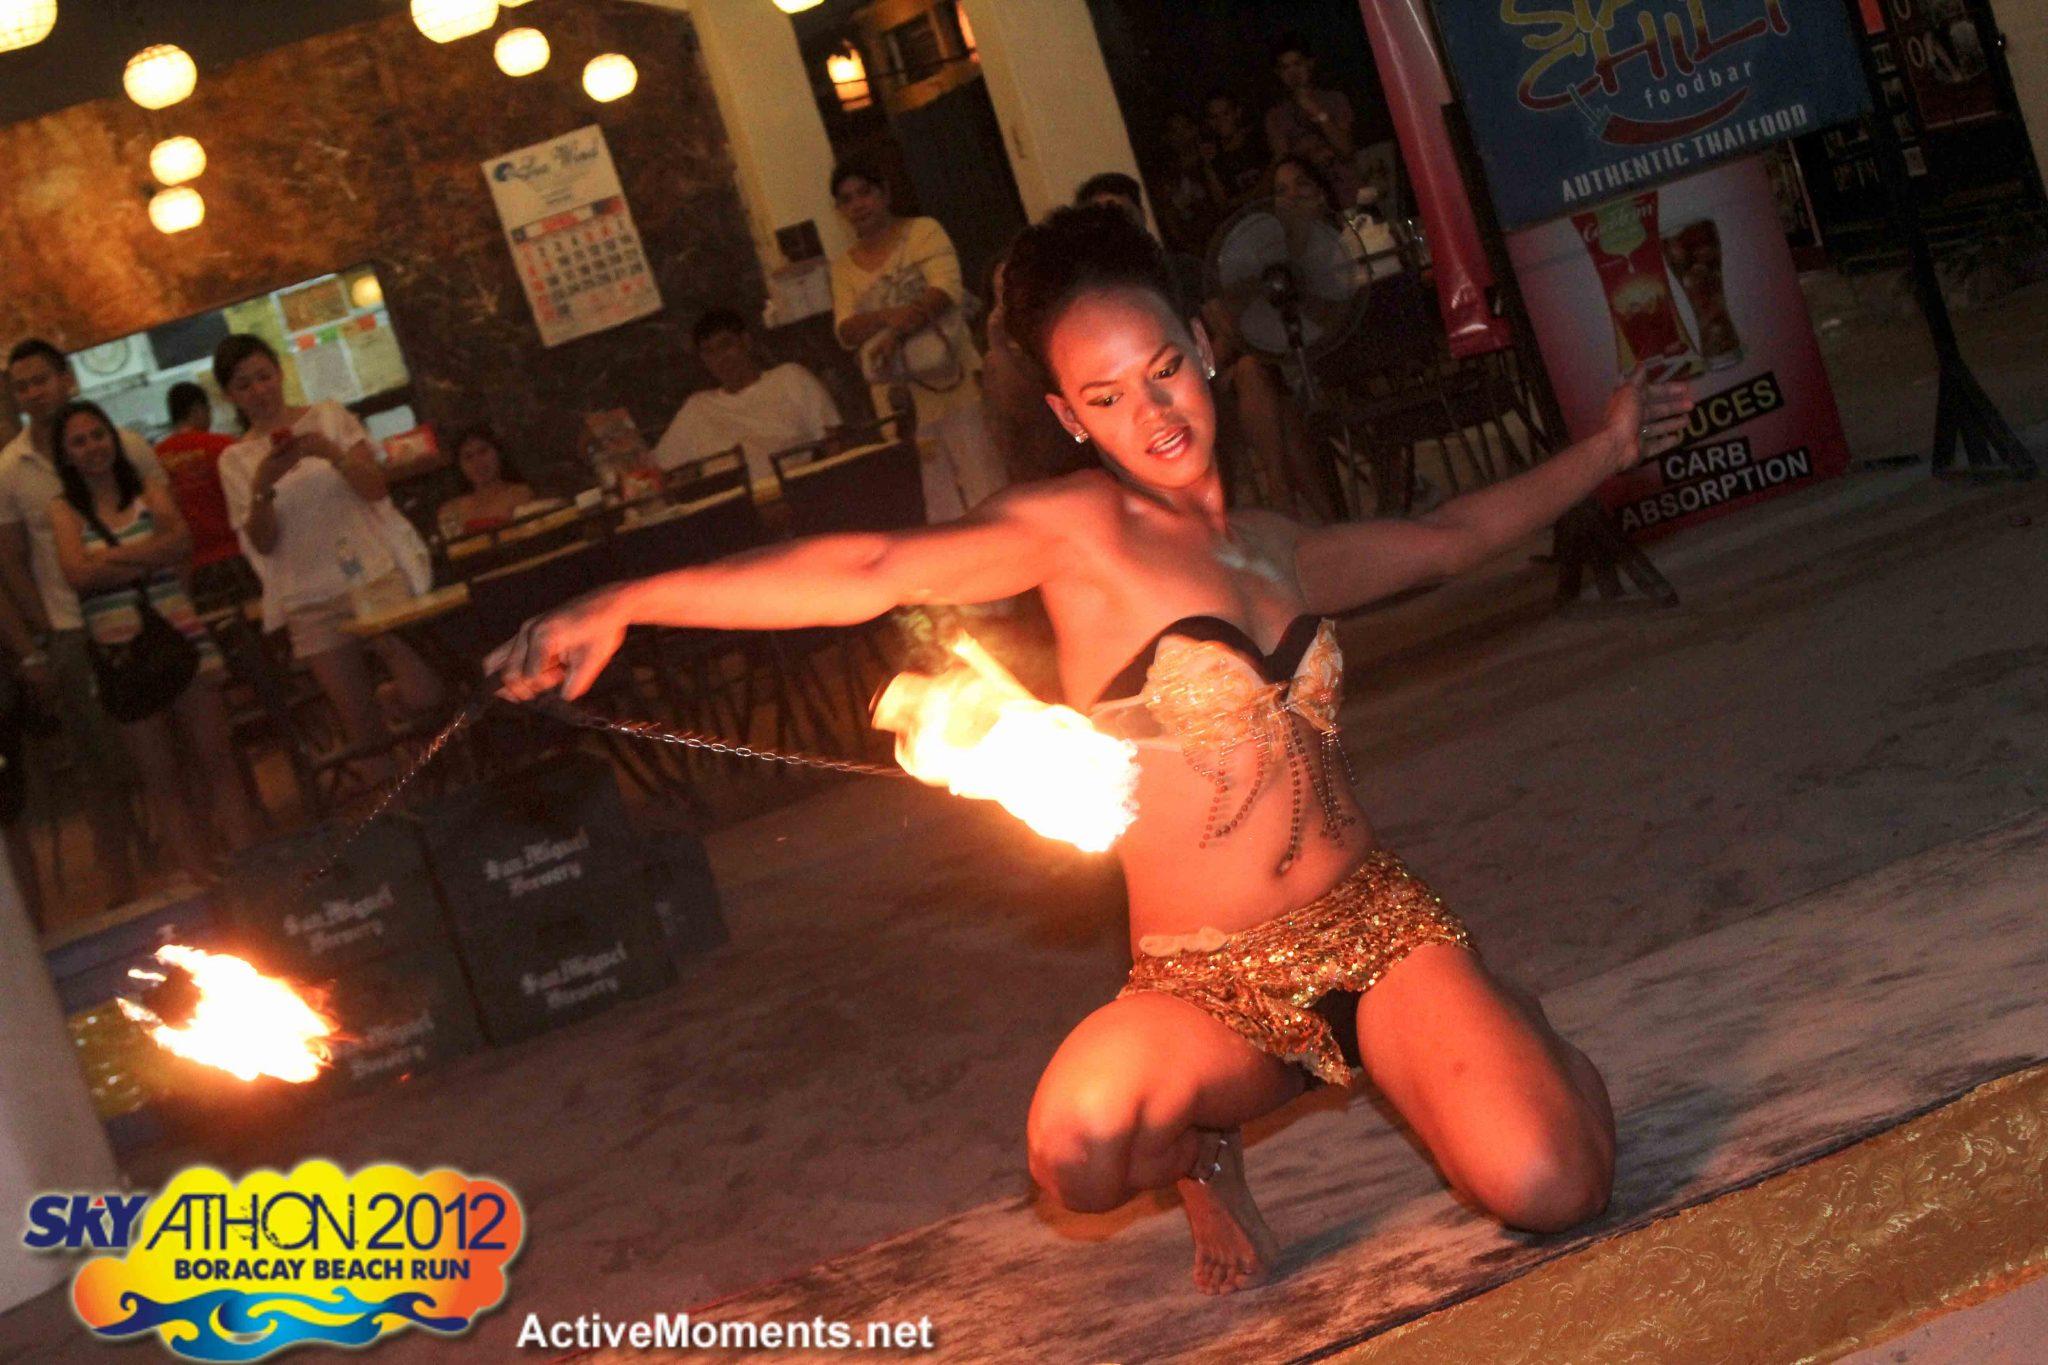 Skyathon 2012: Fire Dancer